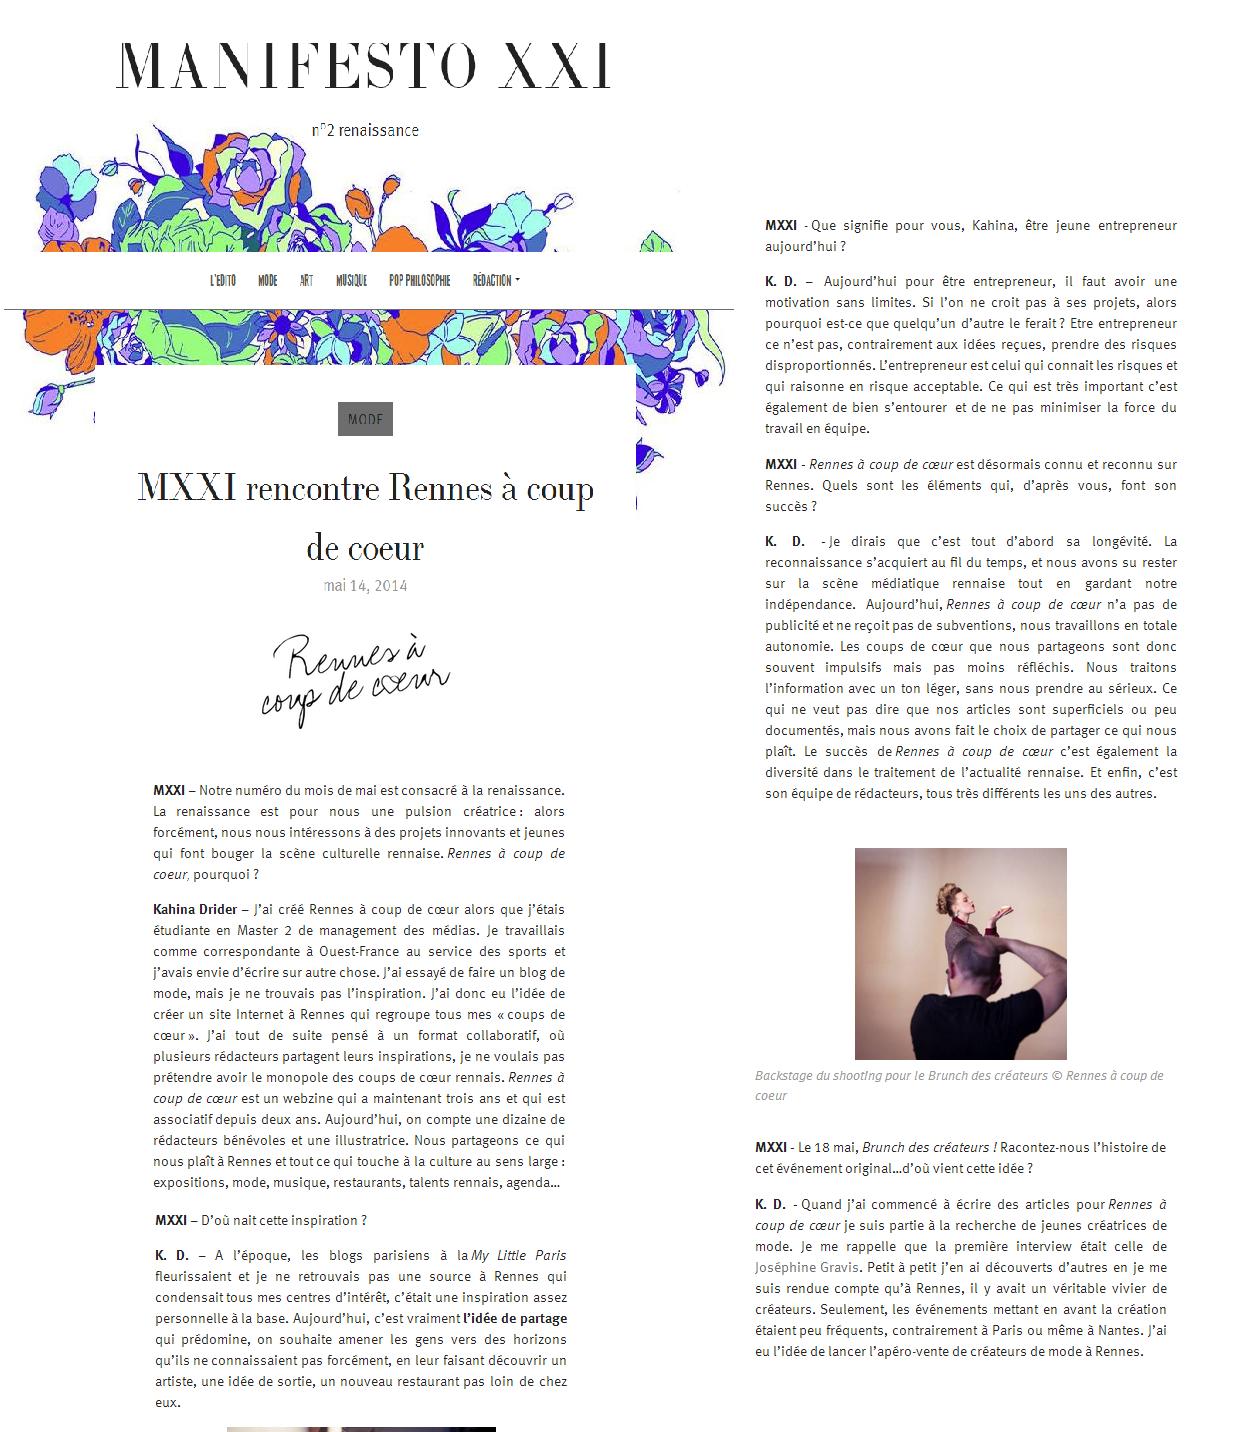 Manifesto XXI - mai 2014 http://manifesto-21.com/2014/05/14/mxxi-rencontre-rennes-a-coup-de-coeur/